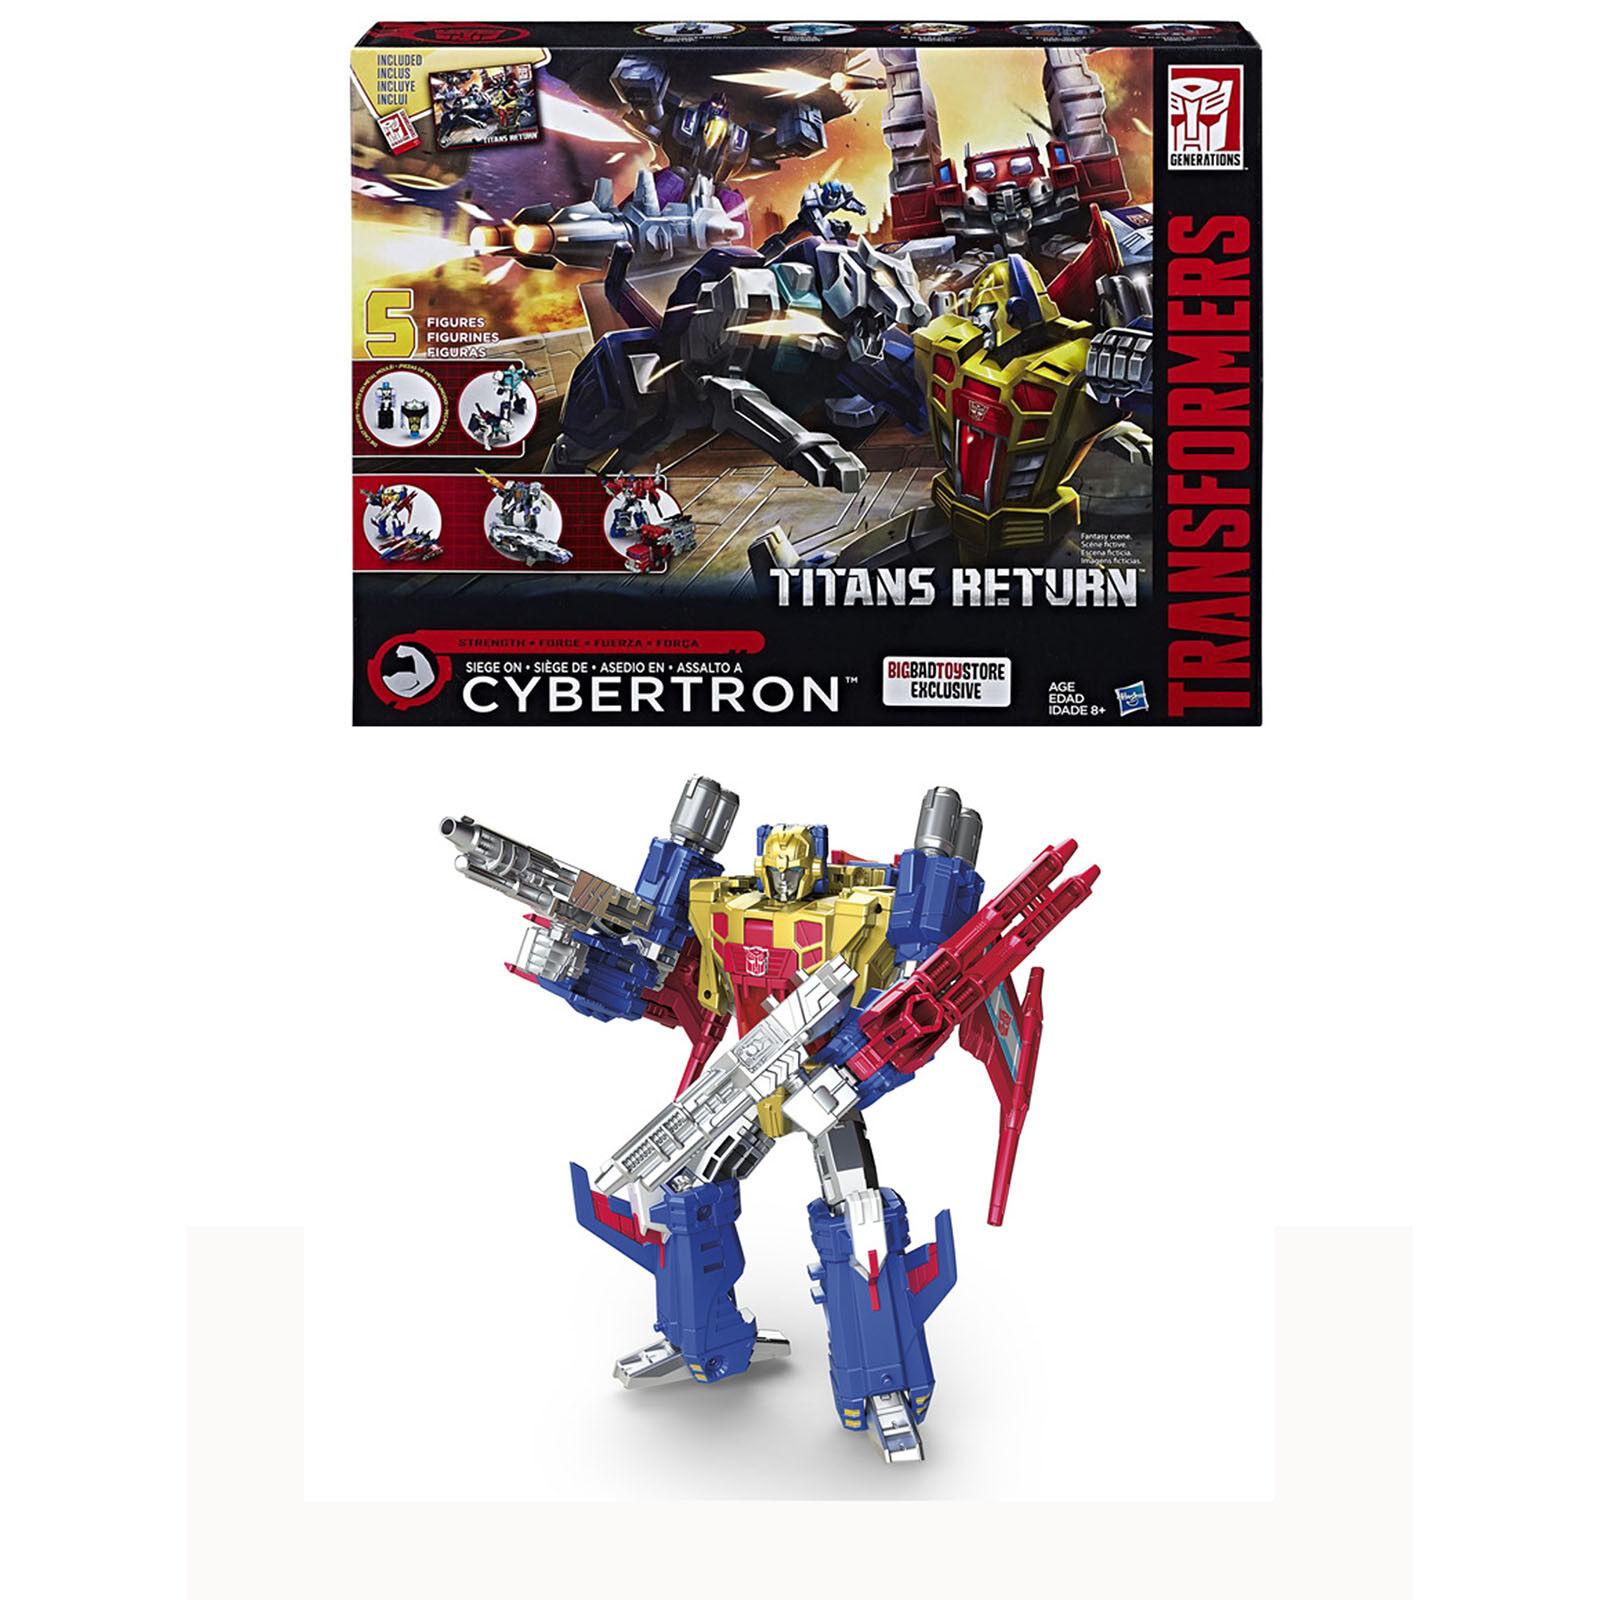 Transformers Titans Return SIEGE ON CYBERTRON 5 Figures Gift Robots Toy X-mas